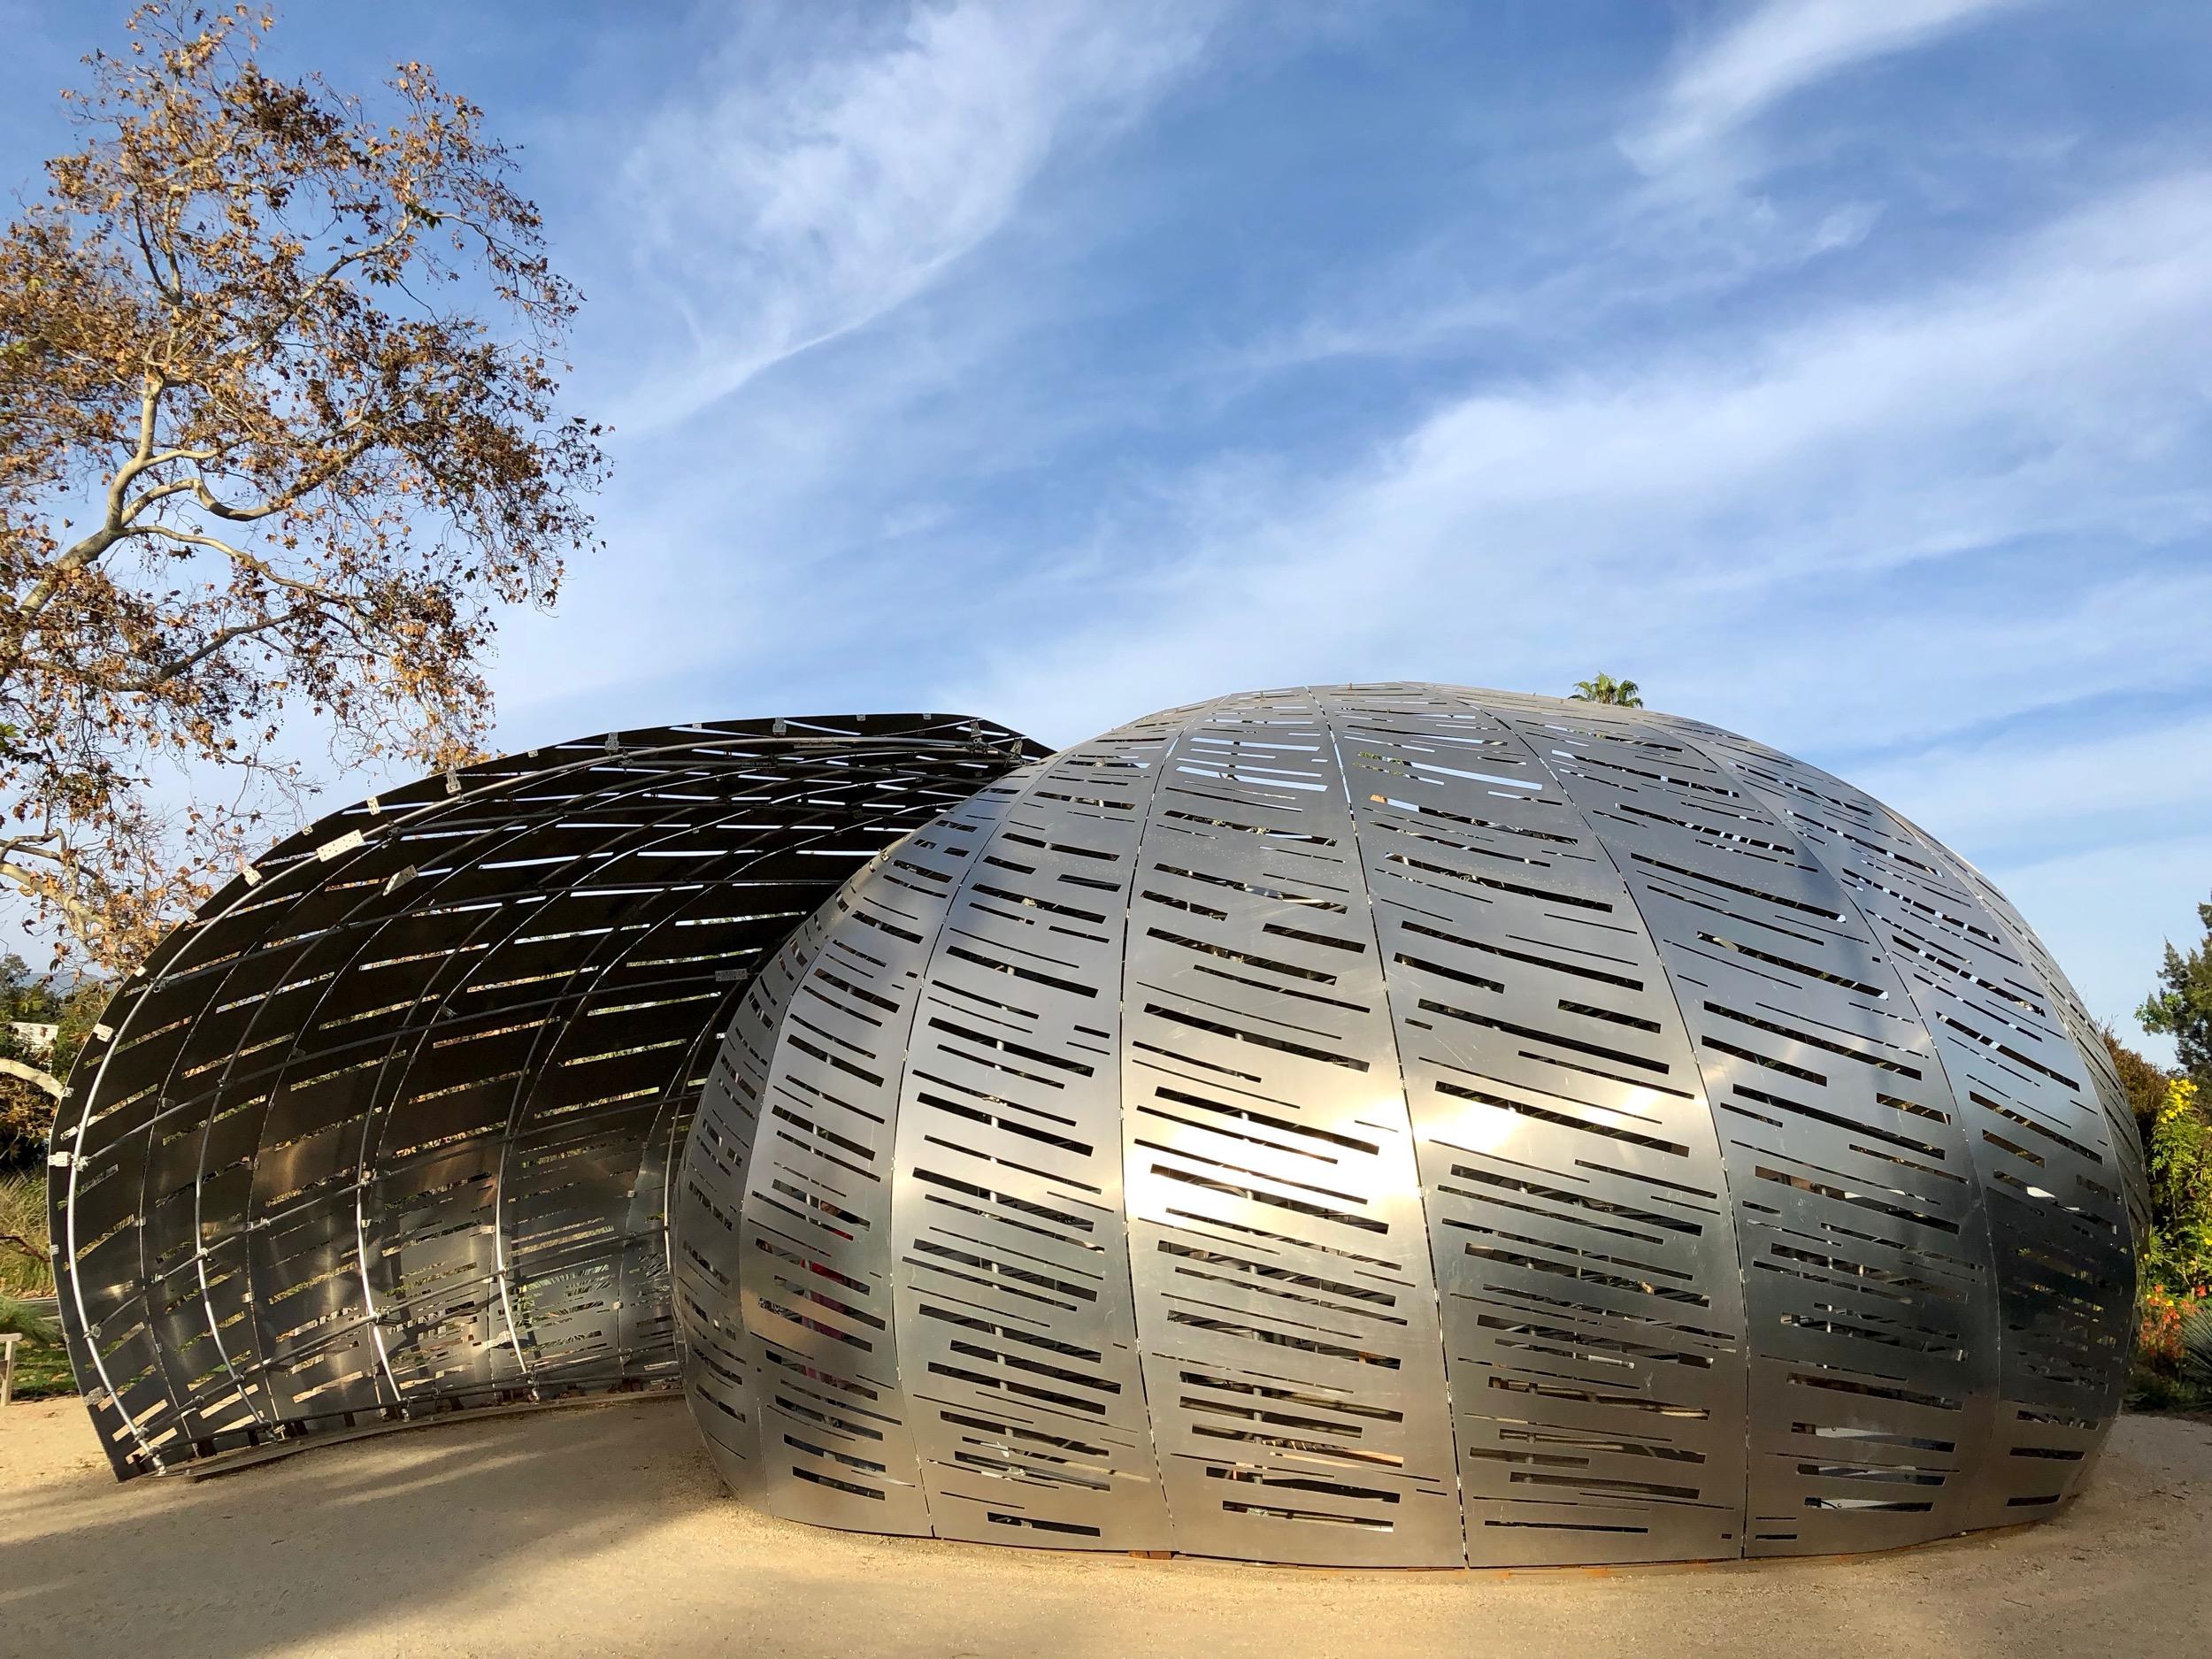 Orbit Pavilion